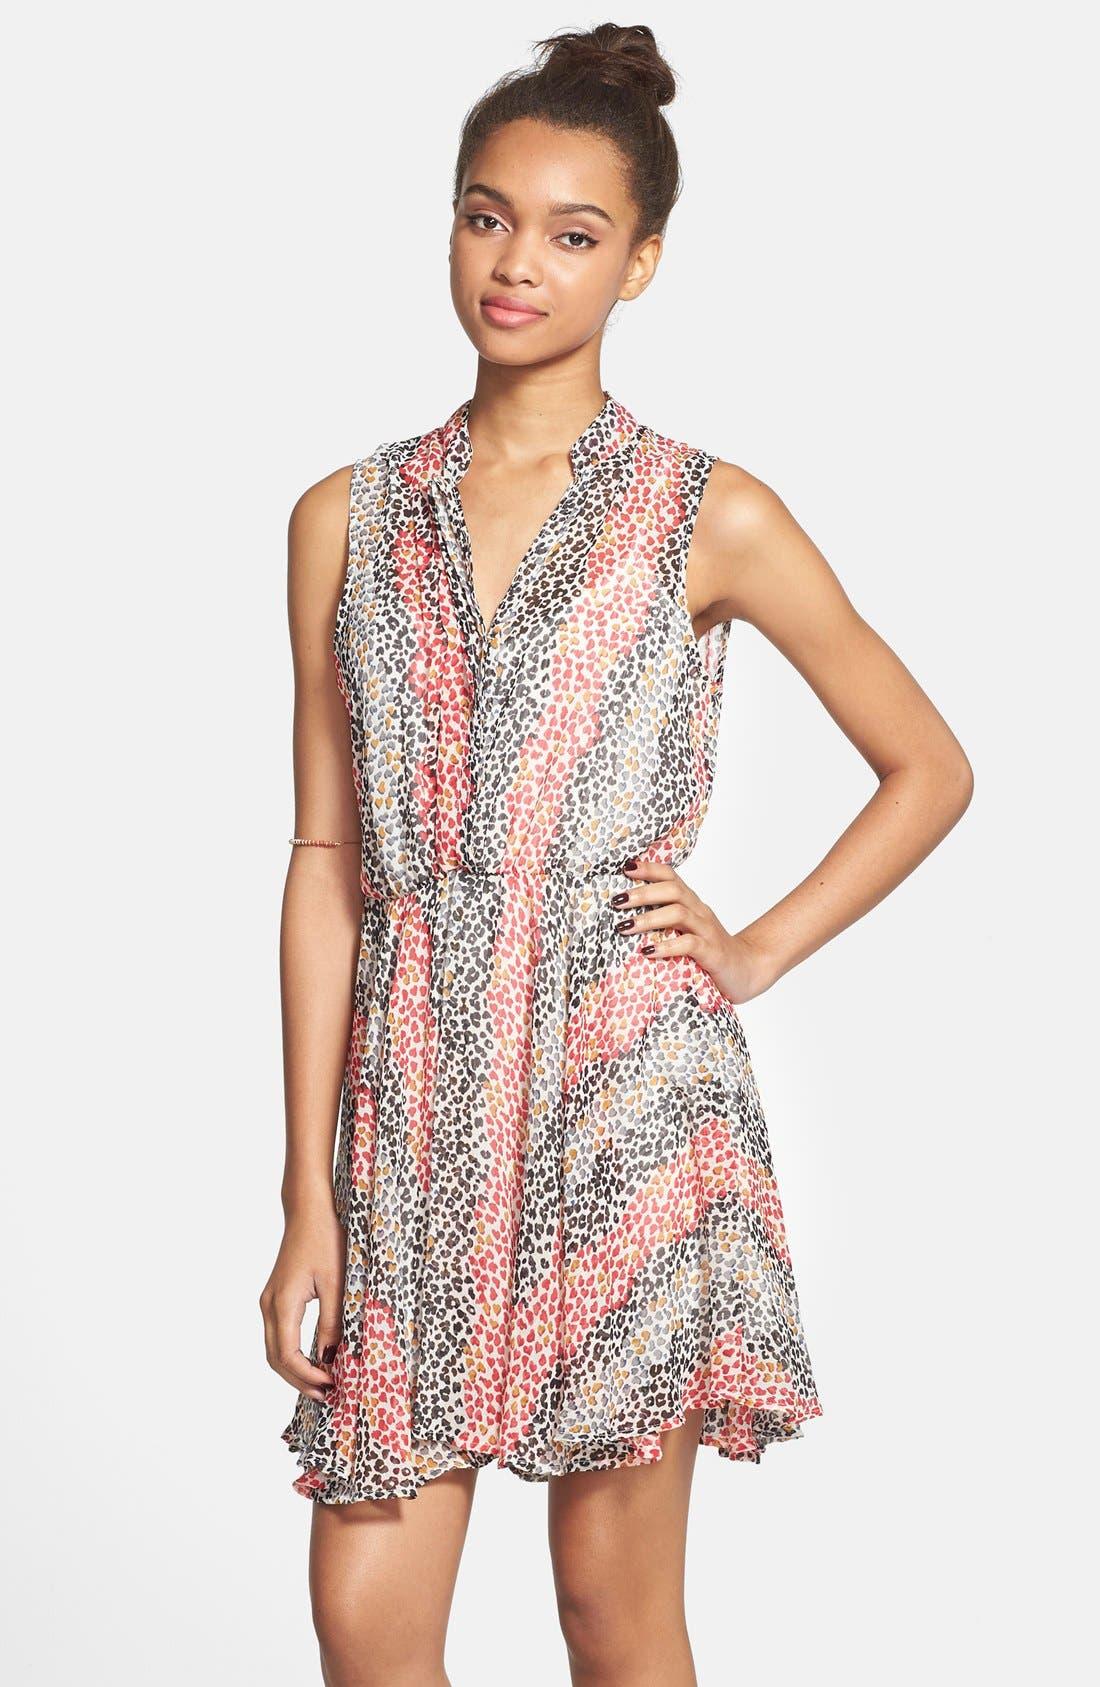 Alternate Image 1 Selected - Mimi Chica Sleeveless Surplice Dress (Juniors)